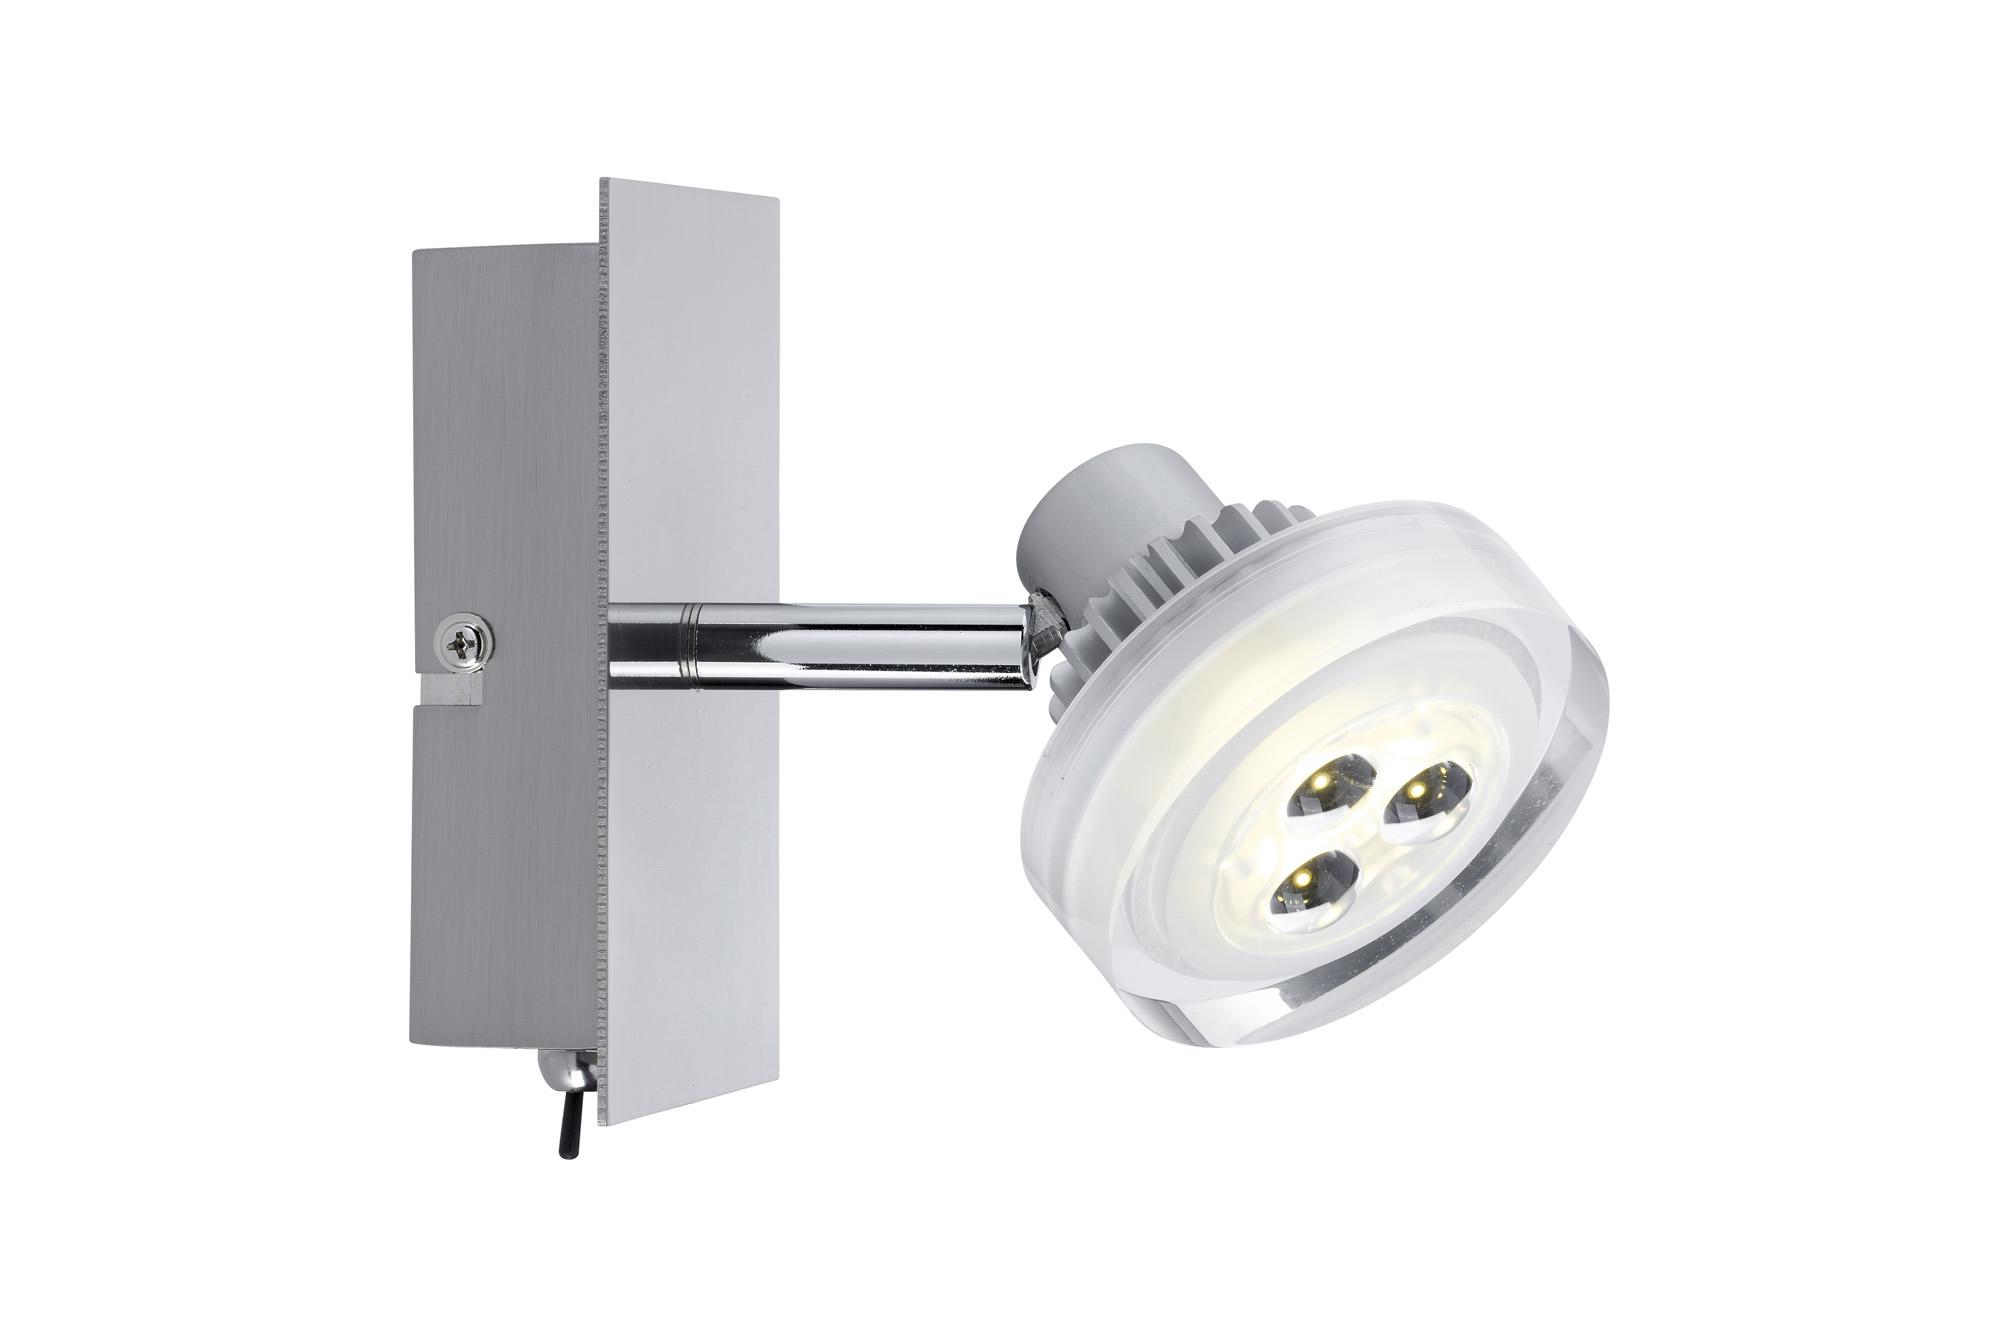 Paulmann. 60195 Светильник Gloria LED 1x 5 W, 230/12 V, 3000 K/ 1x 186 lm, никель тертый